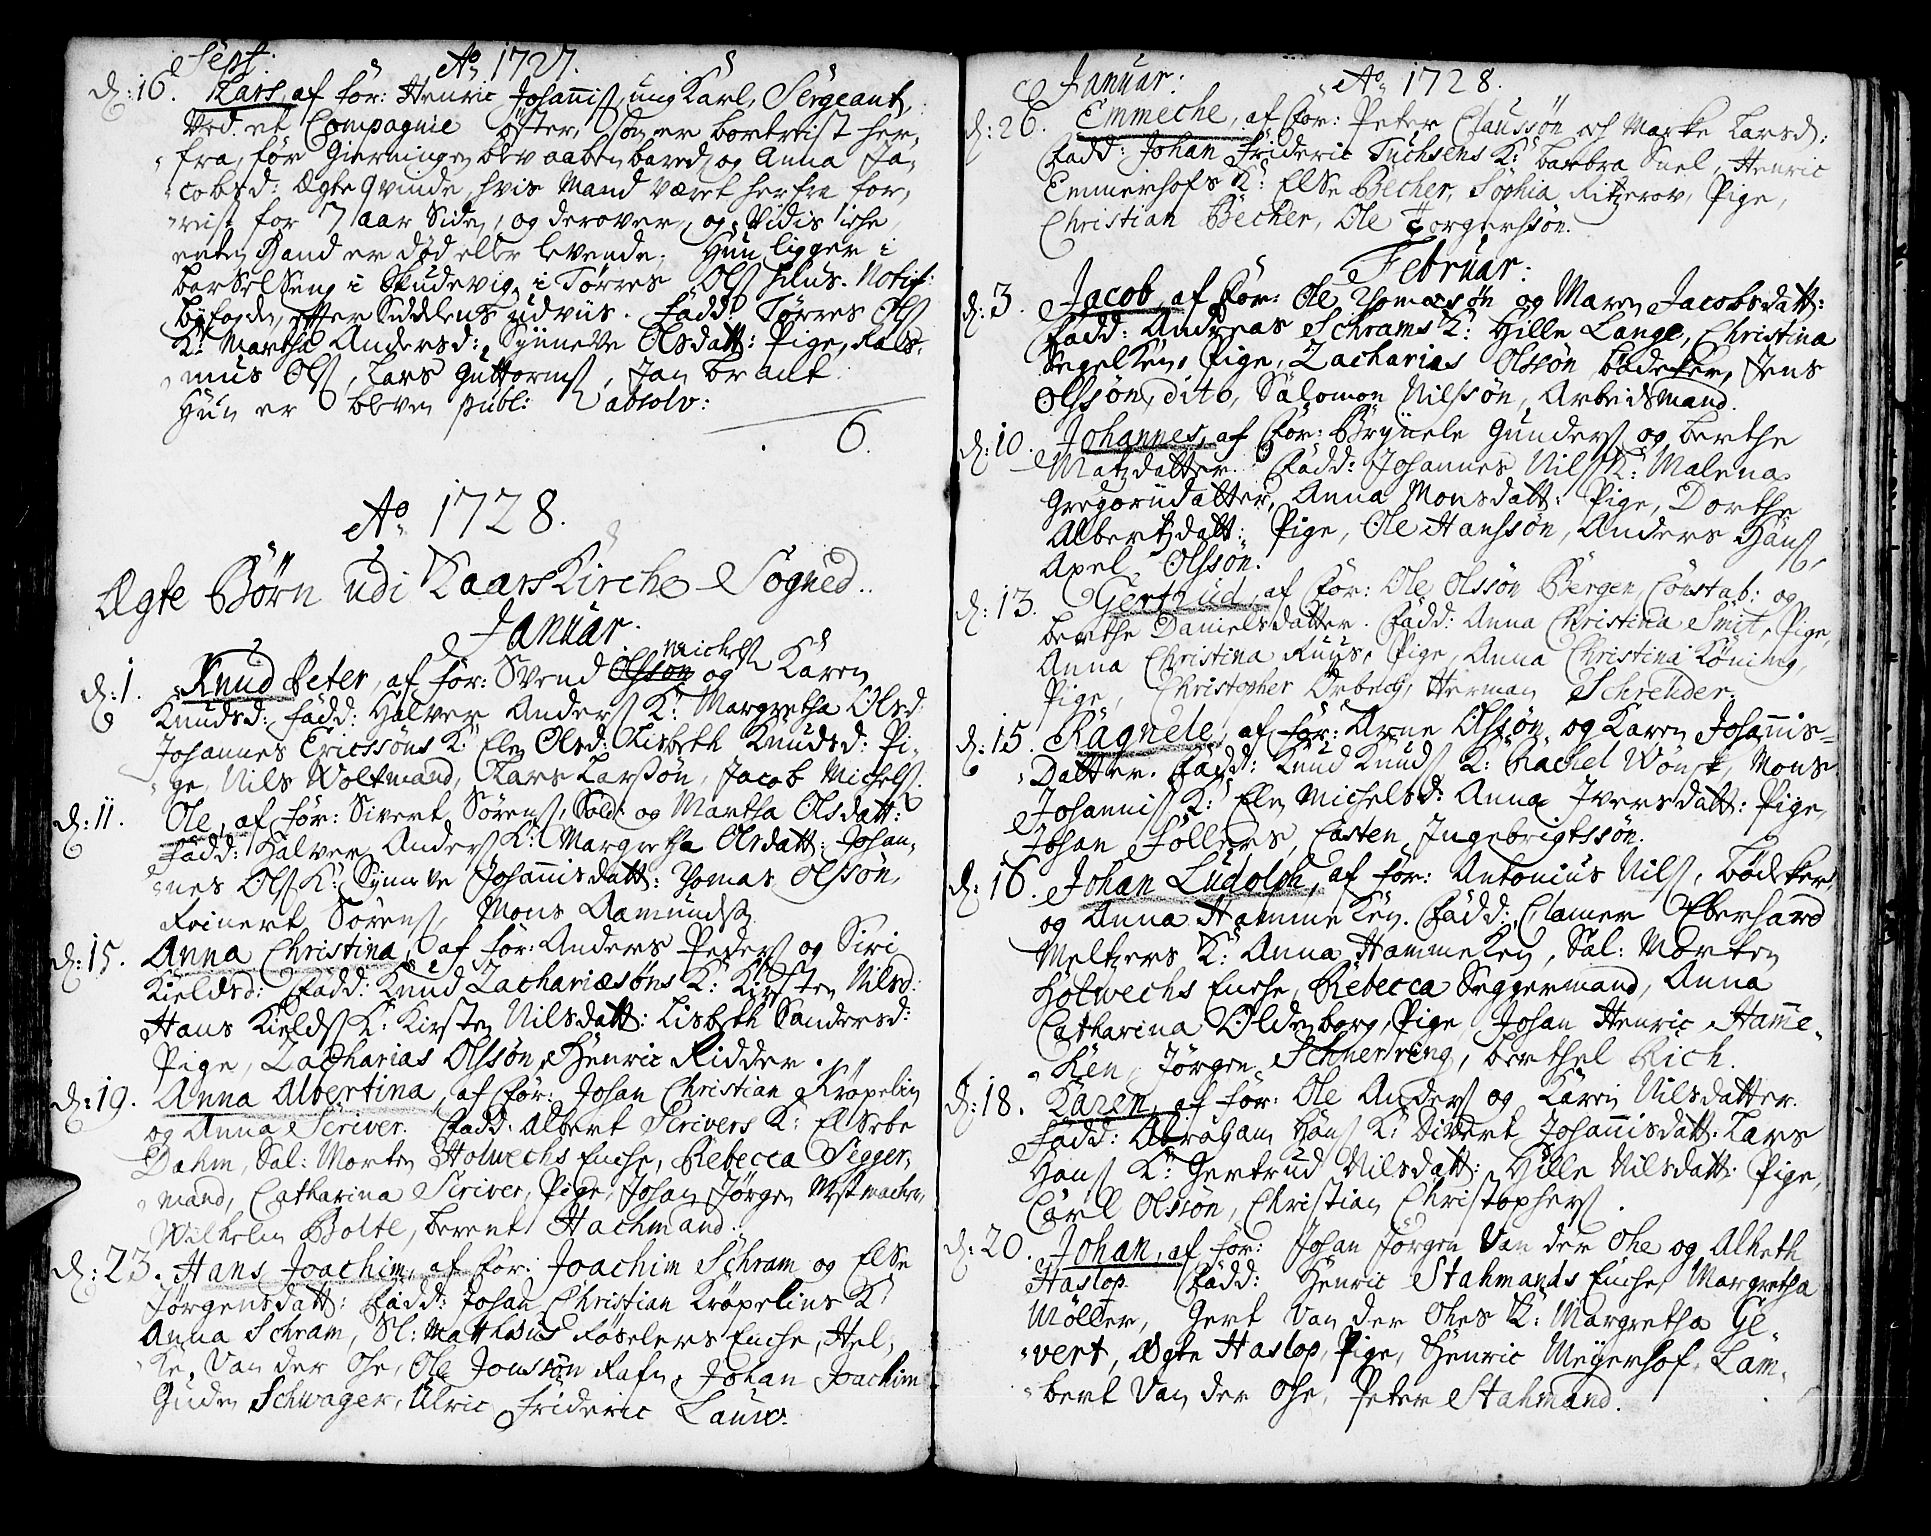 SAB, Korskirken Sokneprestembete, H/Haa/L0004: Ministerialbok nr. A 4, 1720-1750, s. 78